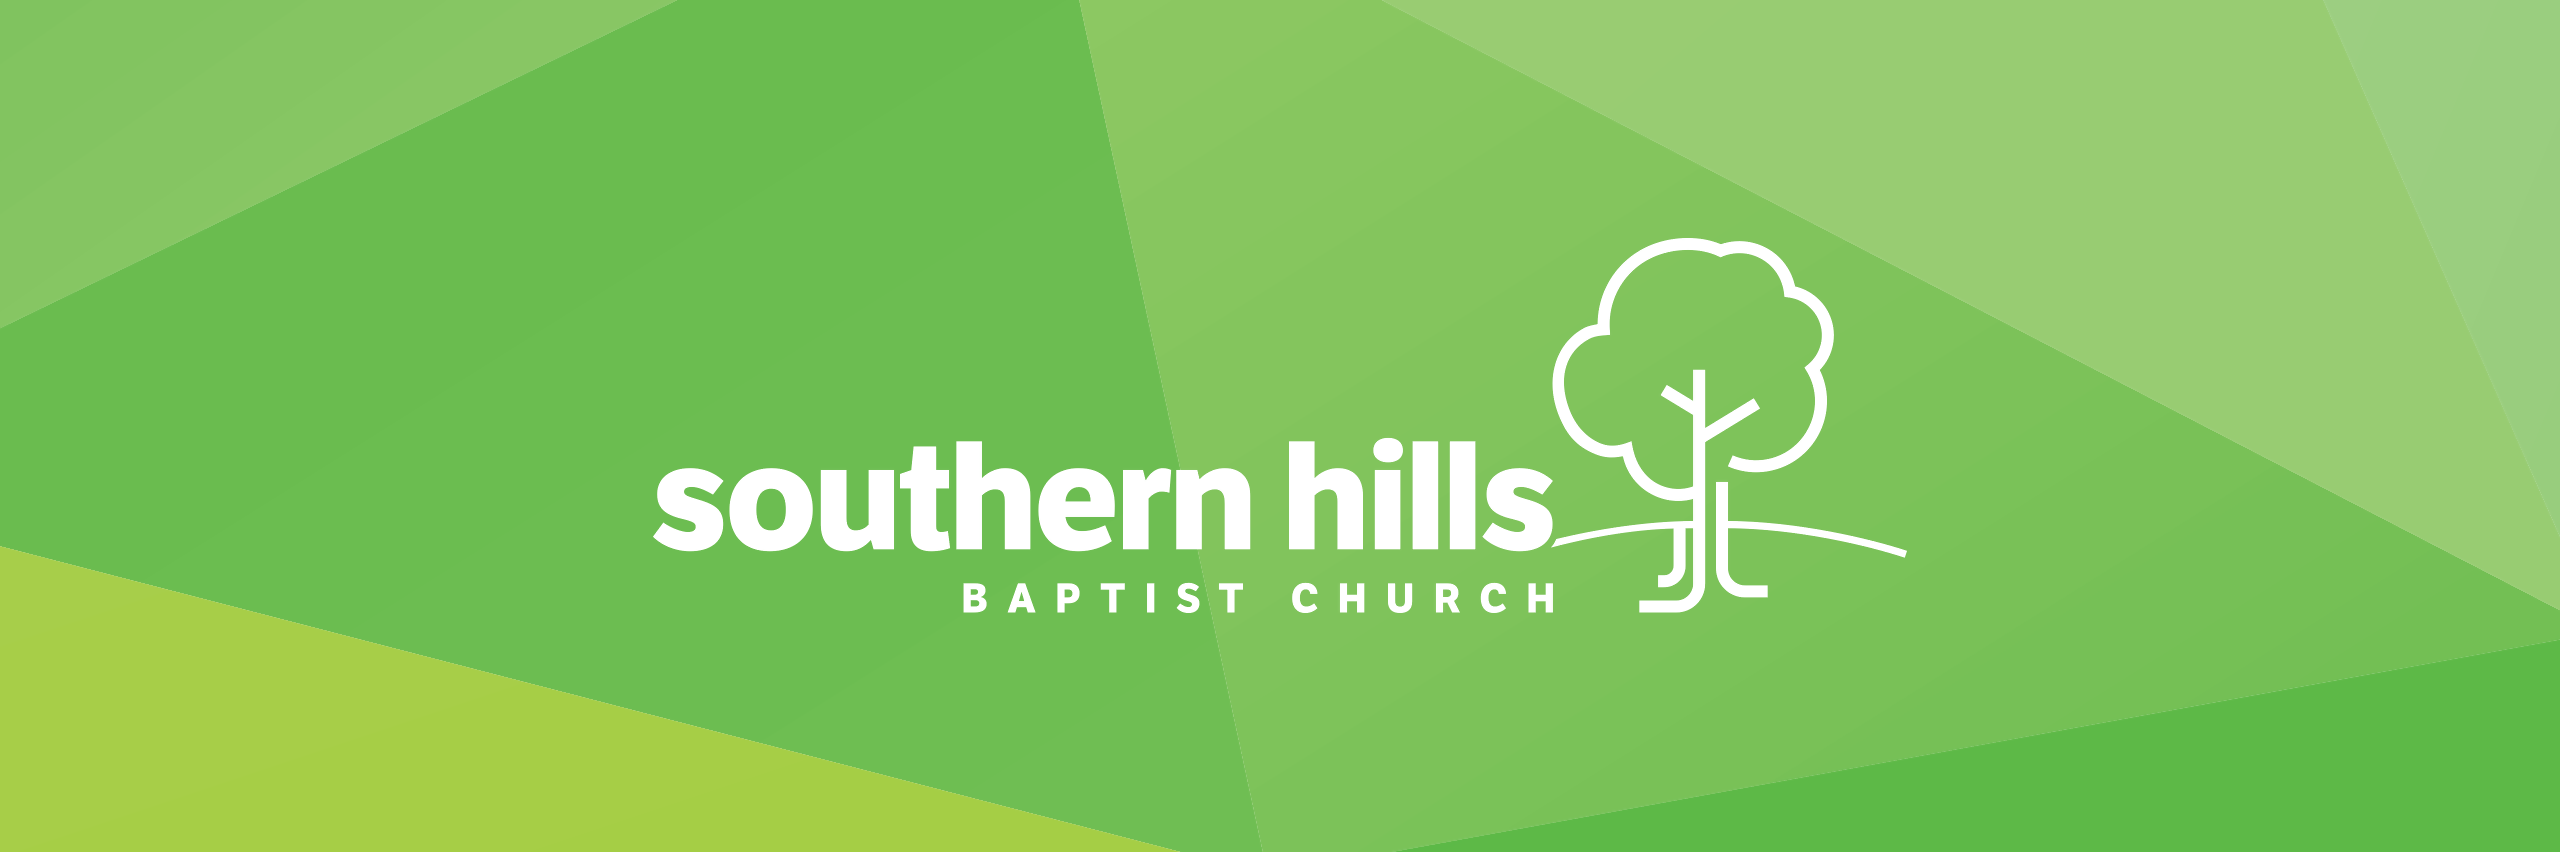 Southern Hills Baptist Church, Tulsa OK